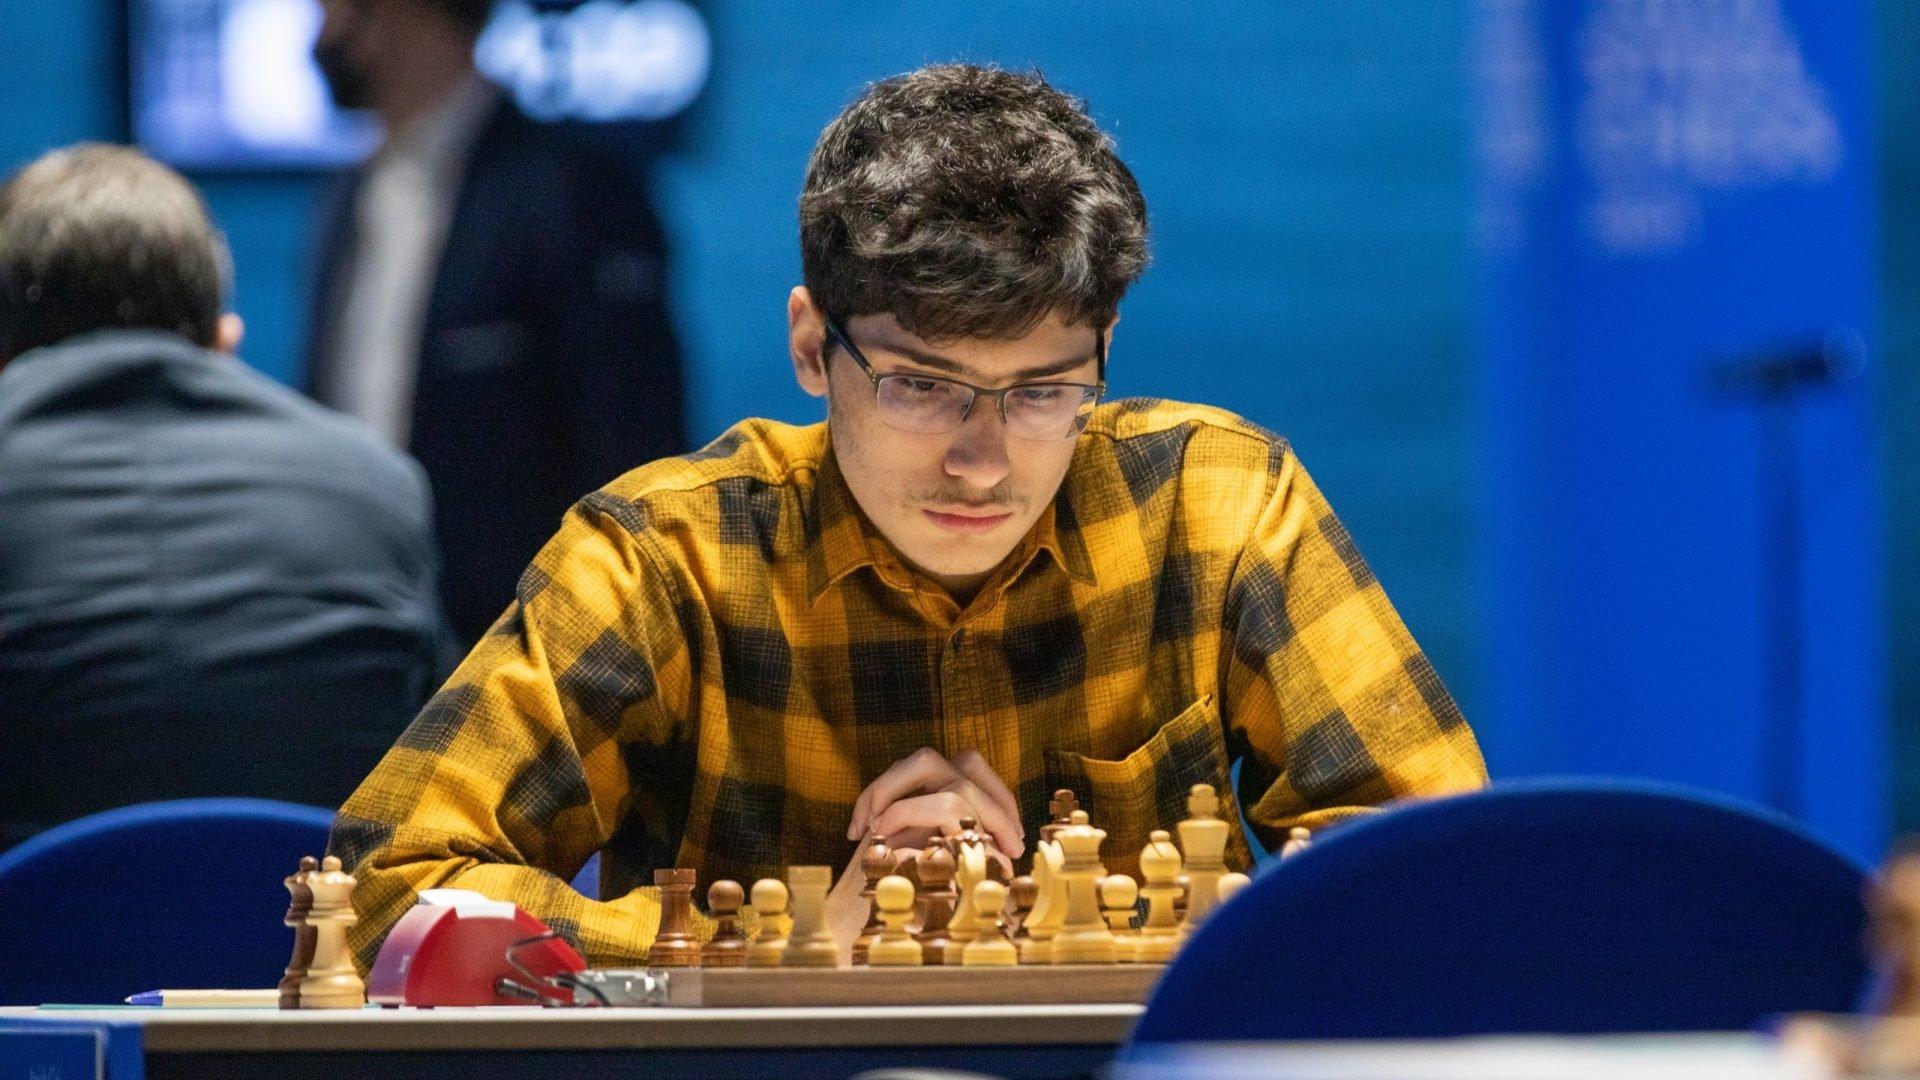 12 Тур. Шахматный турнир в Вейк-ан-Зее 2021 год